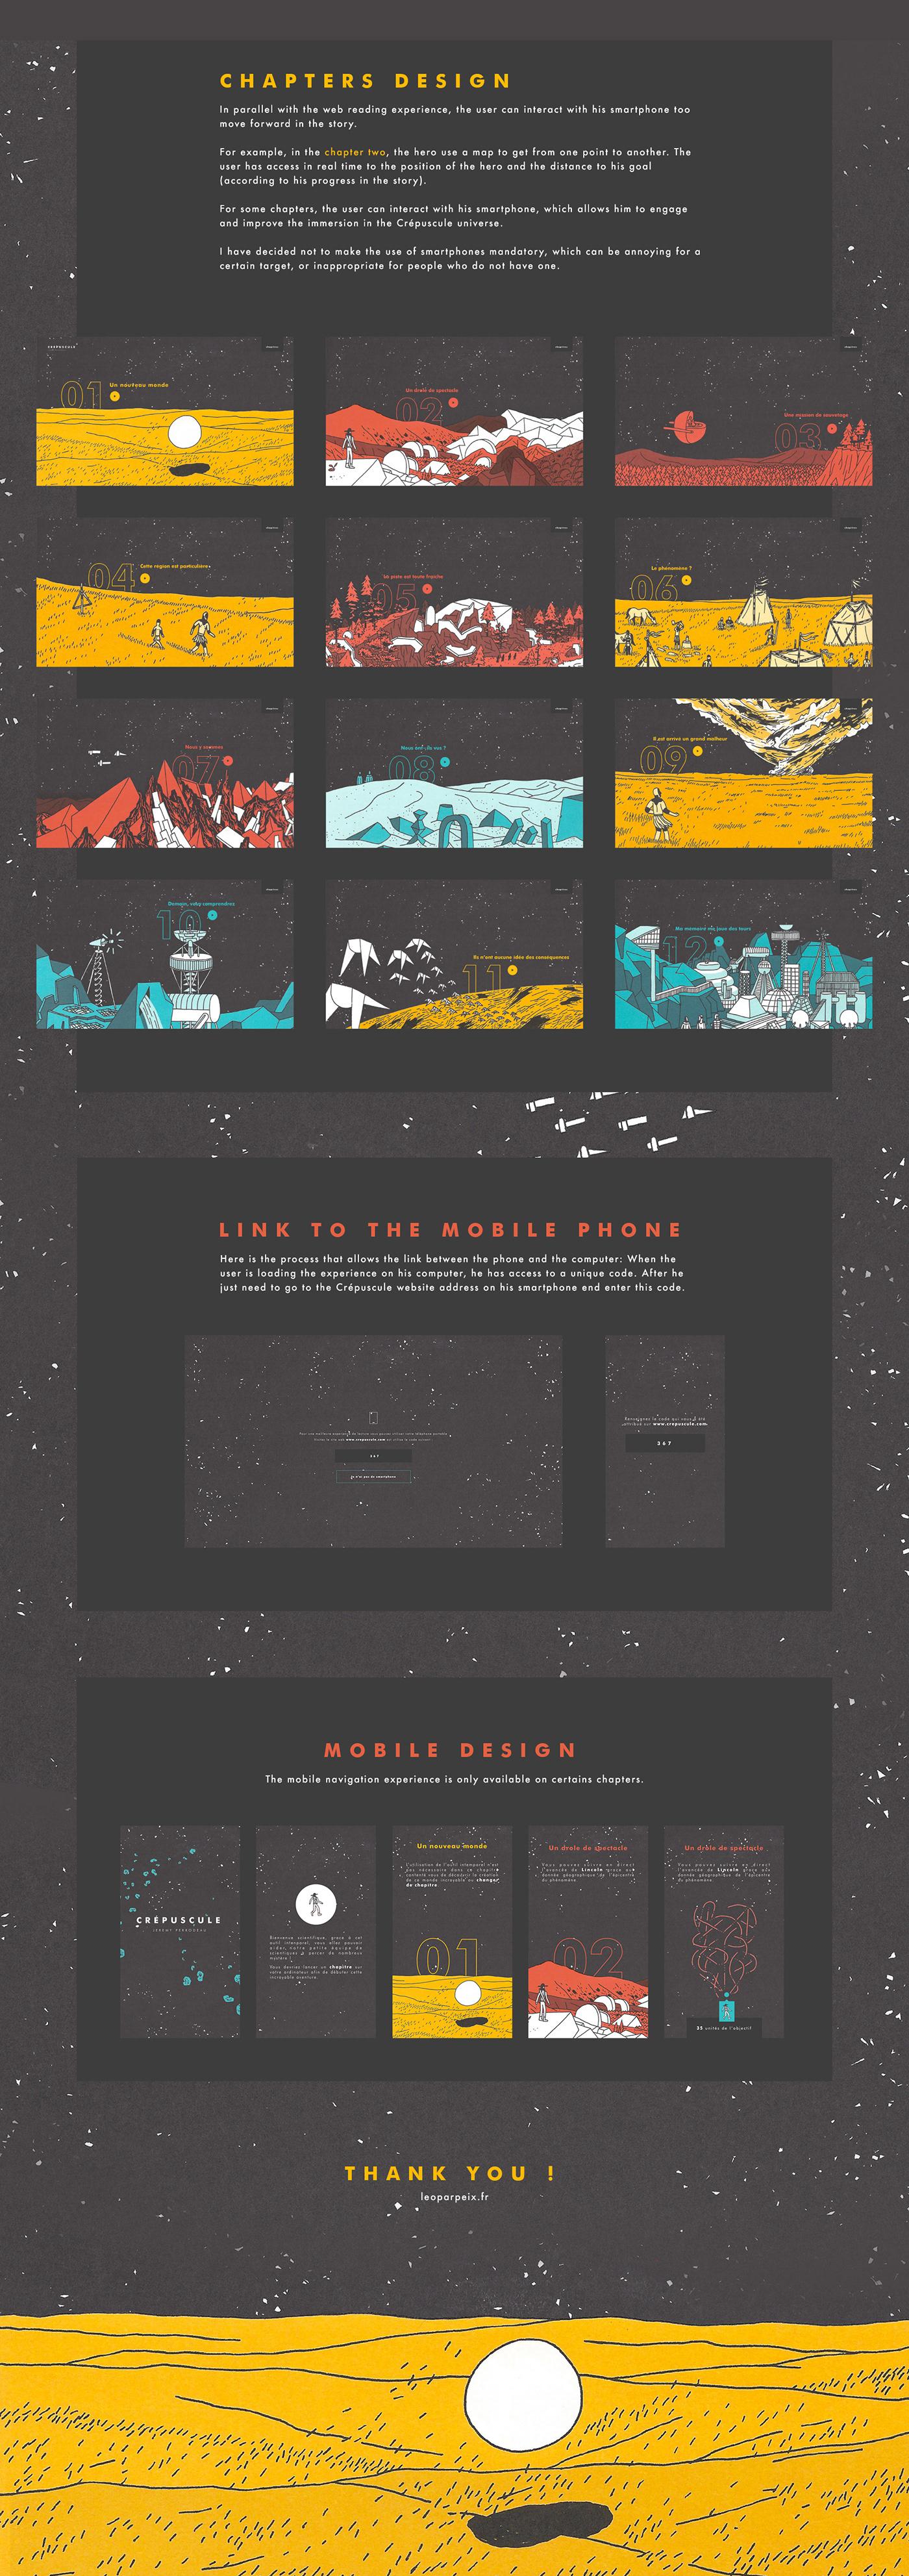 Crépuscule éditions 2024 Jérémy Perrodeau Webdesign colorful interactive reading Comic Book Interactive Experience ui design Space